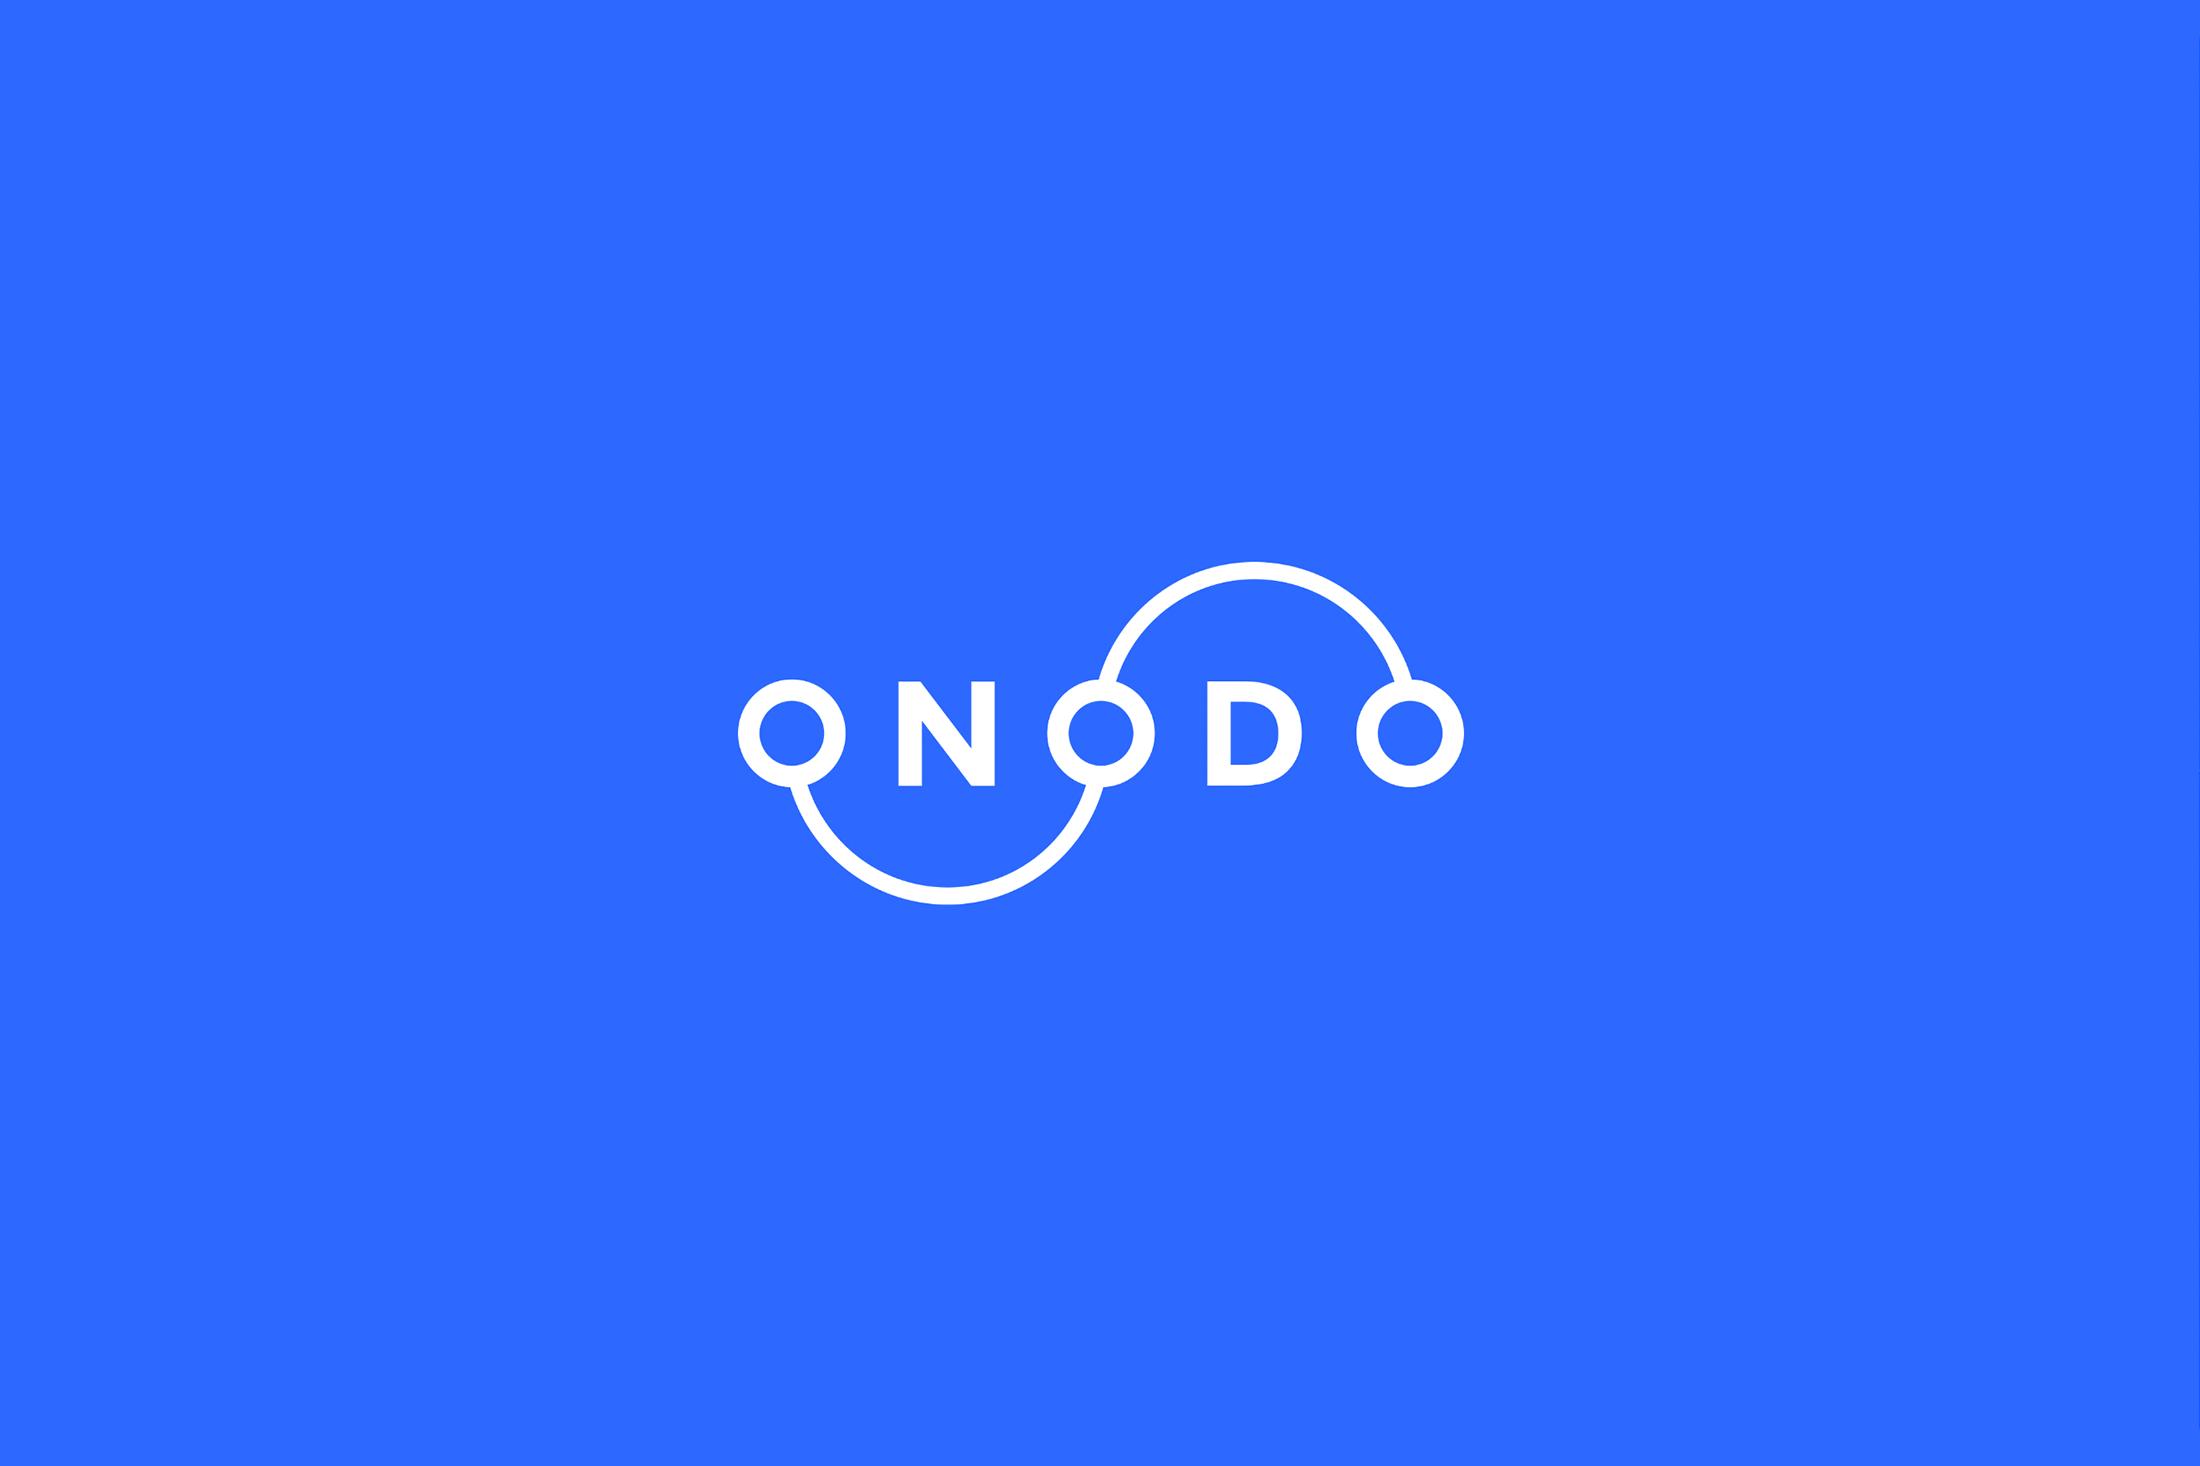 Onodo Branding & UI/UX